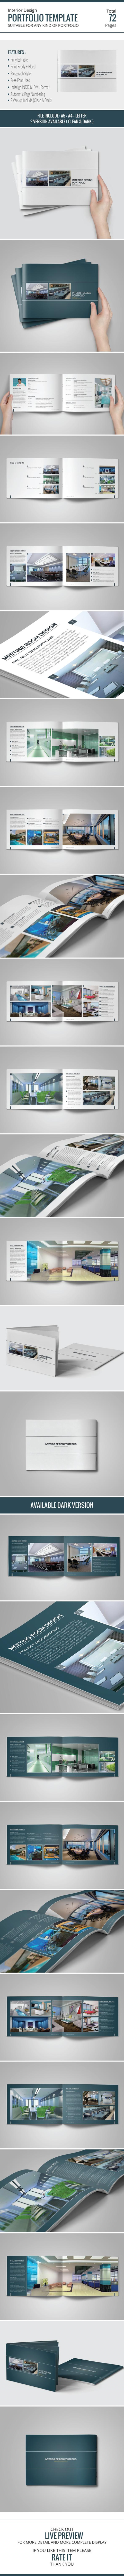 Interior Design Portfolio Template On Behance